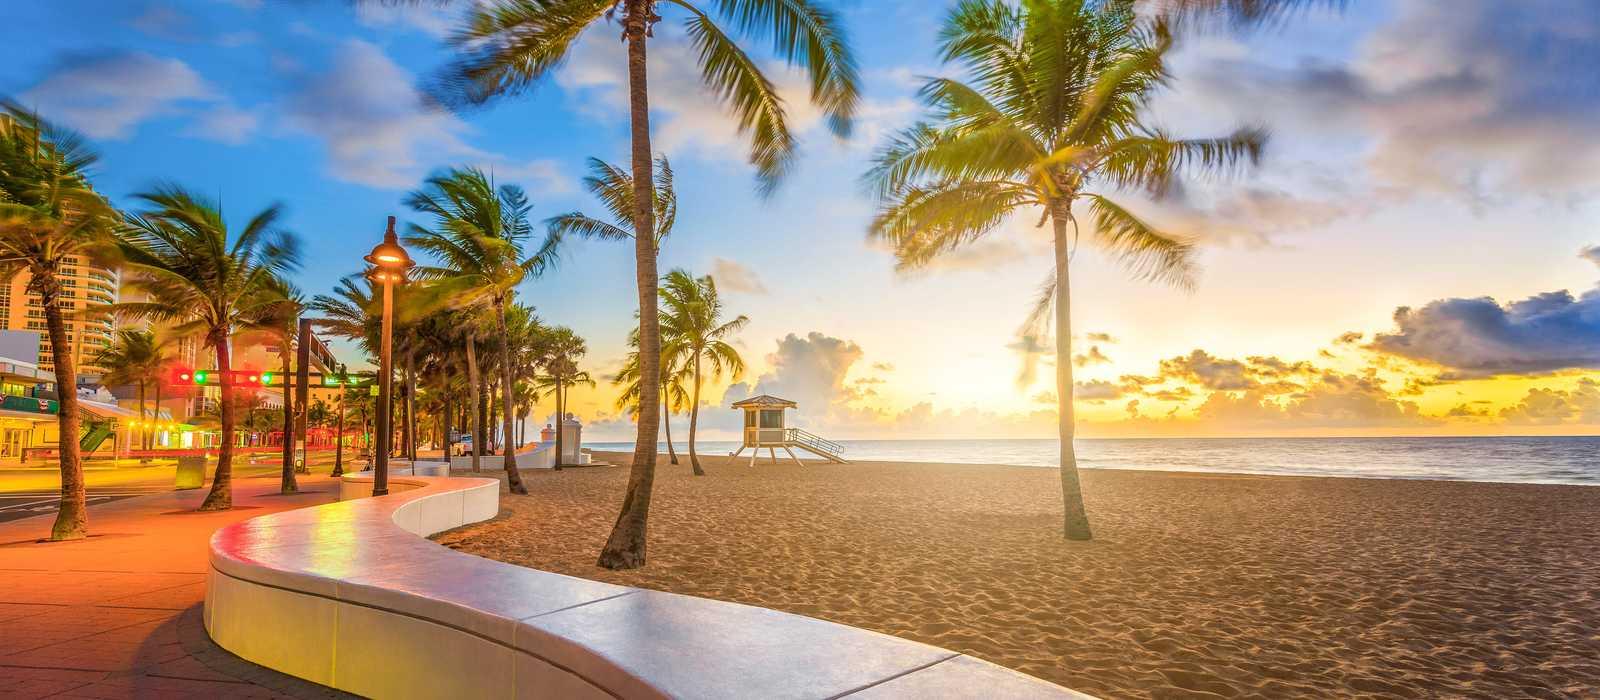 Am Lauderdale Beach in Fort Lauderdale, Florida